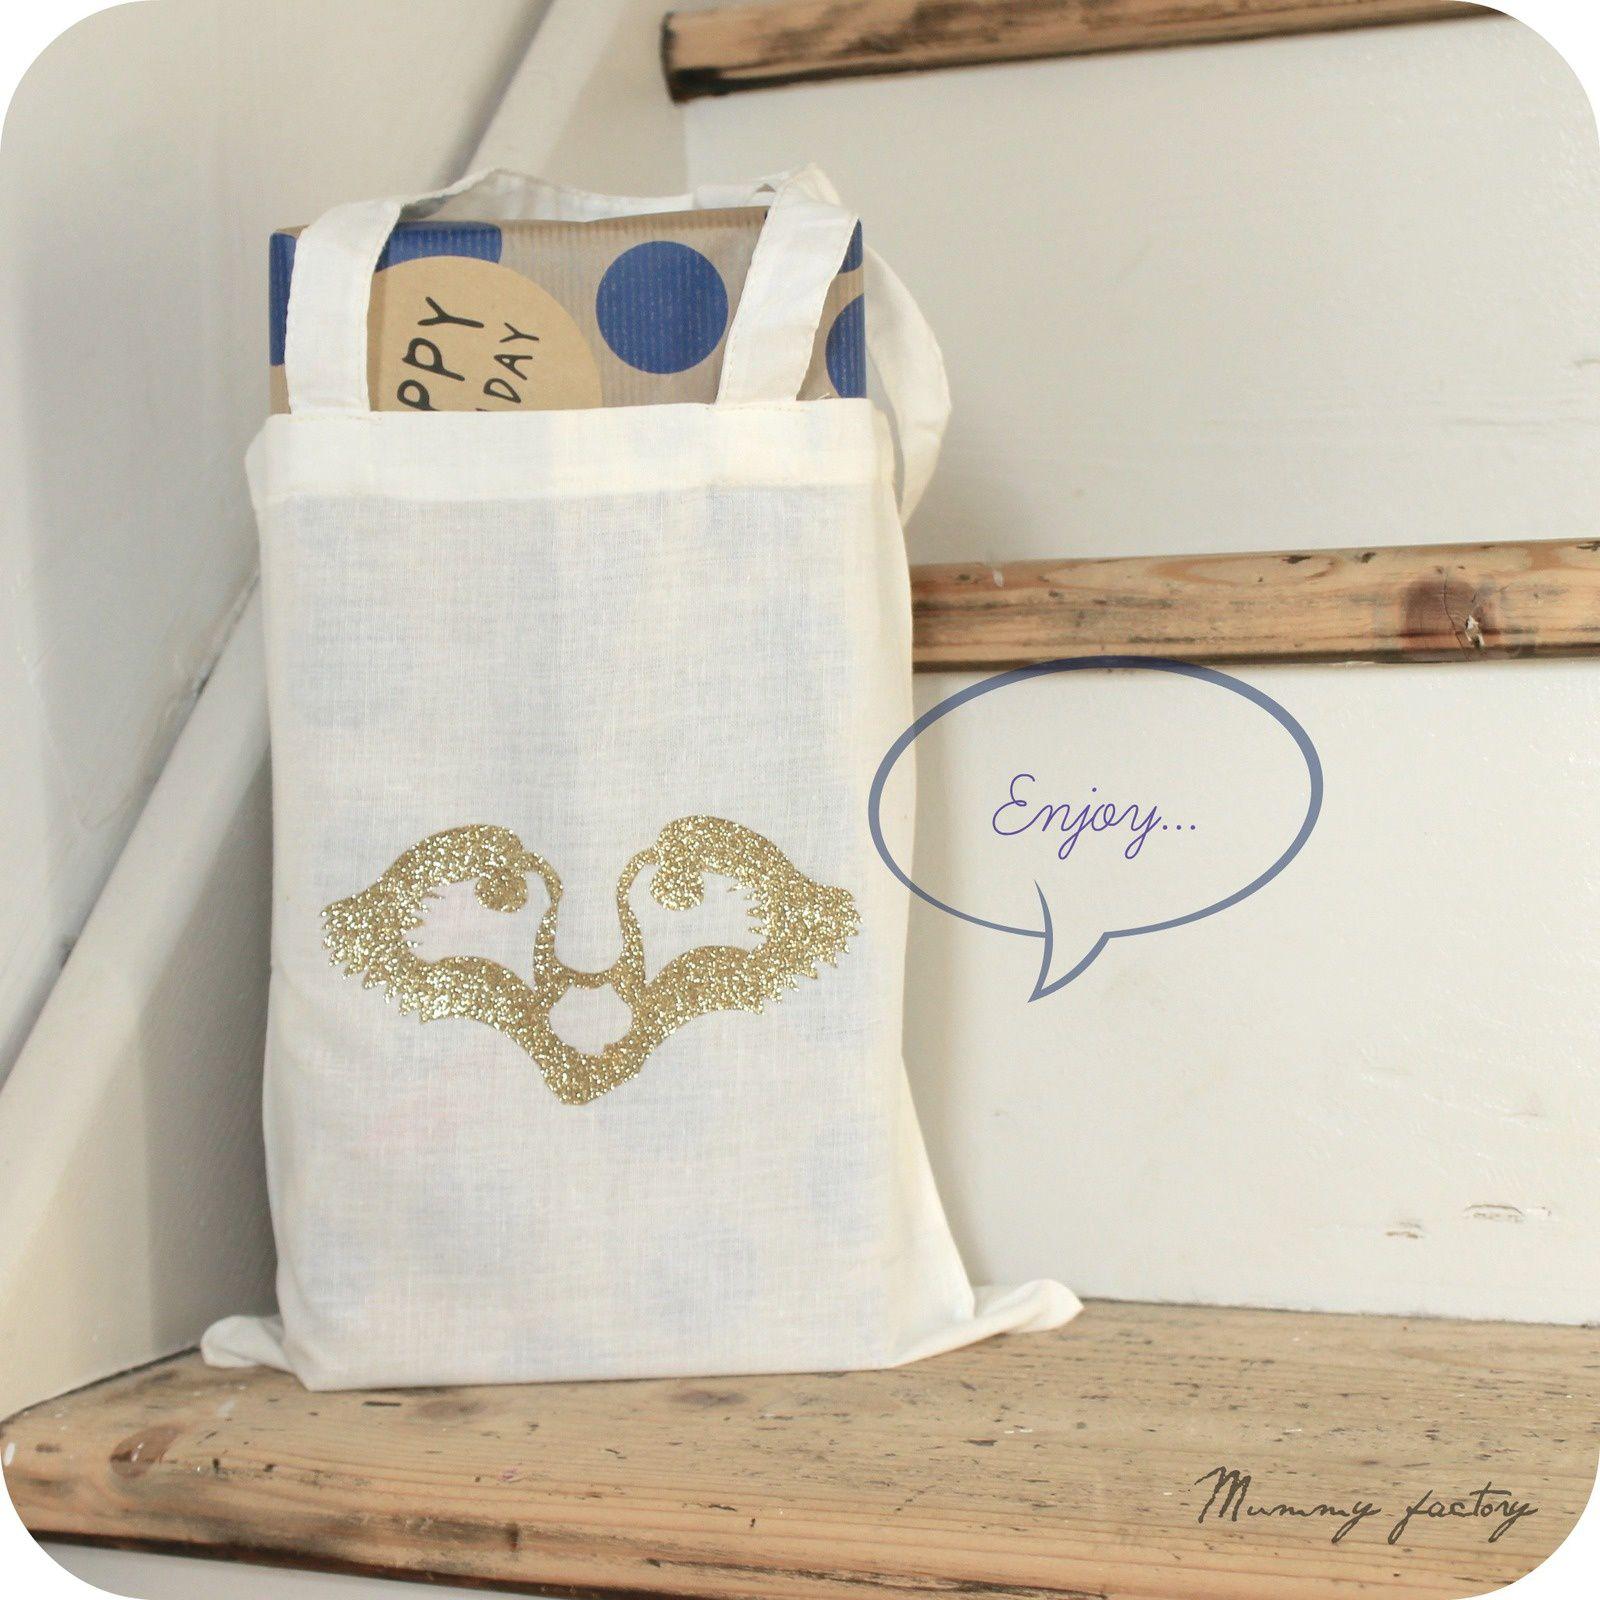 # Vite un sac